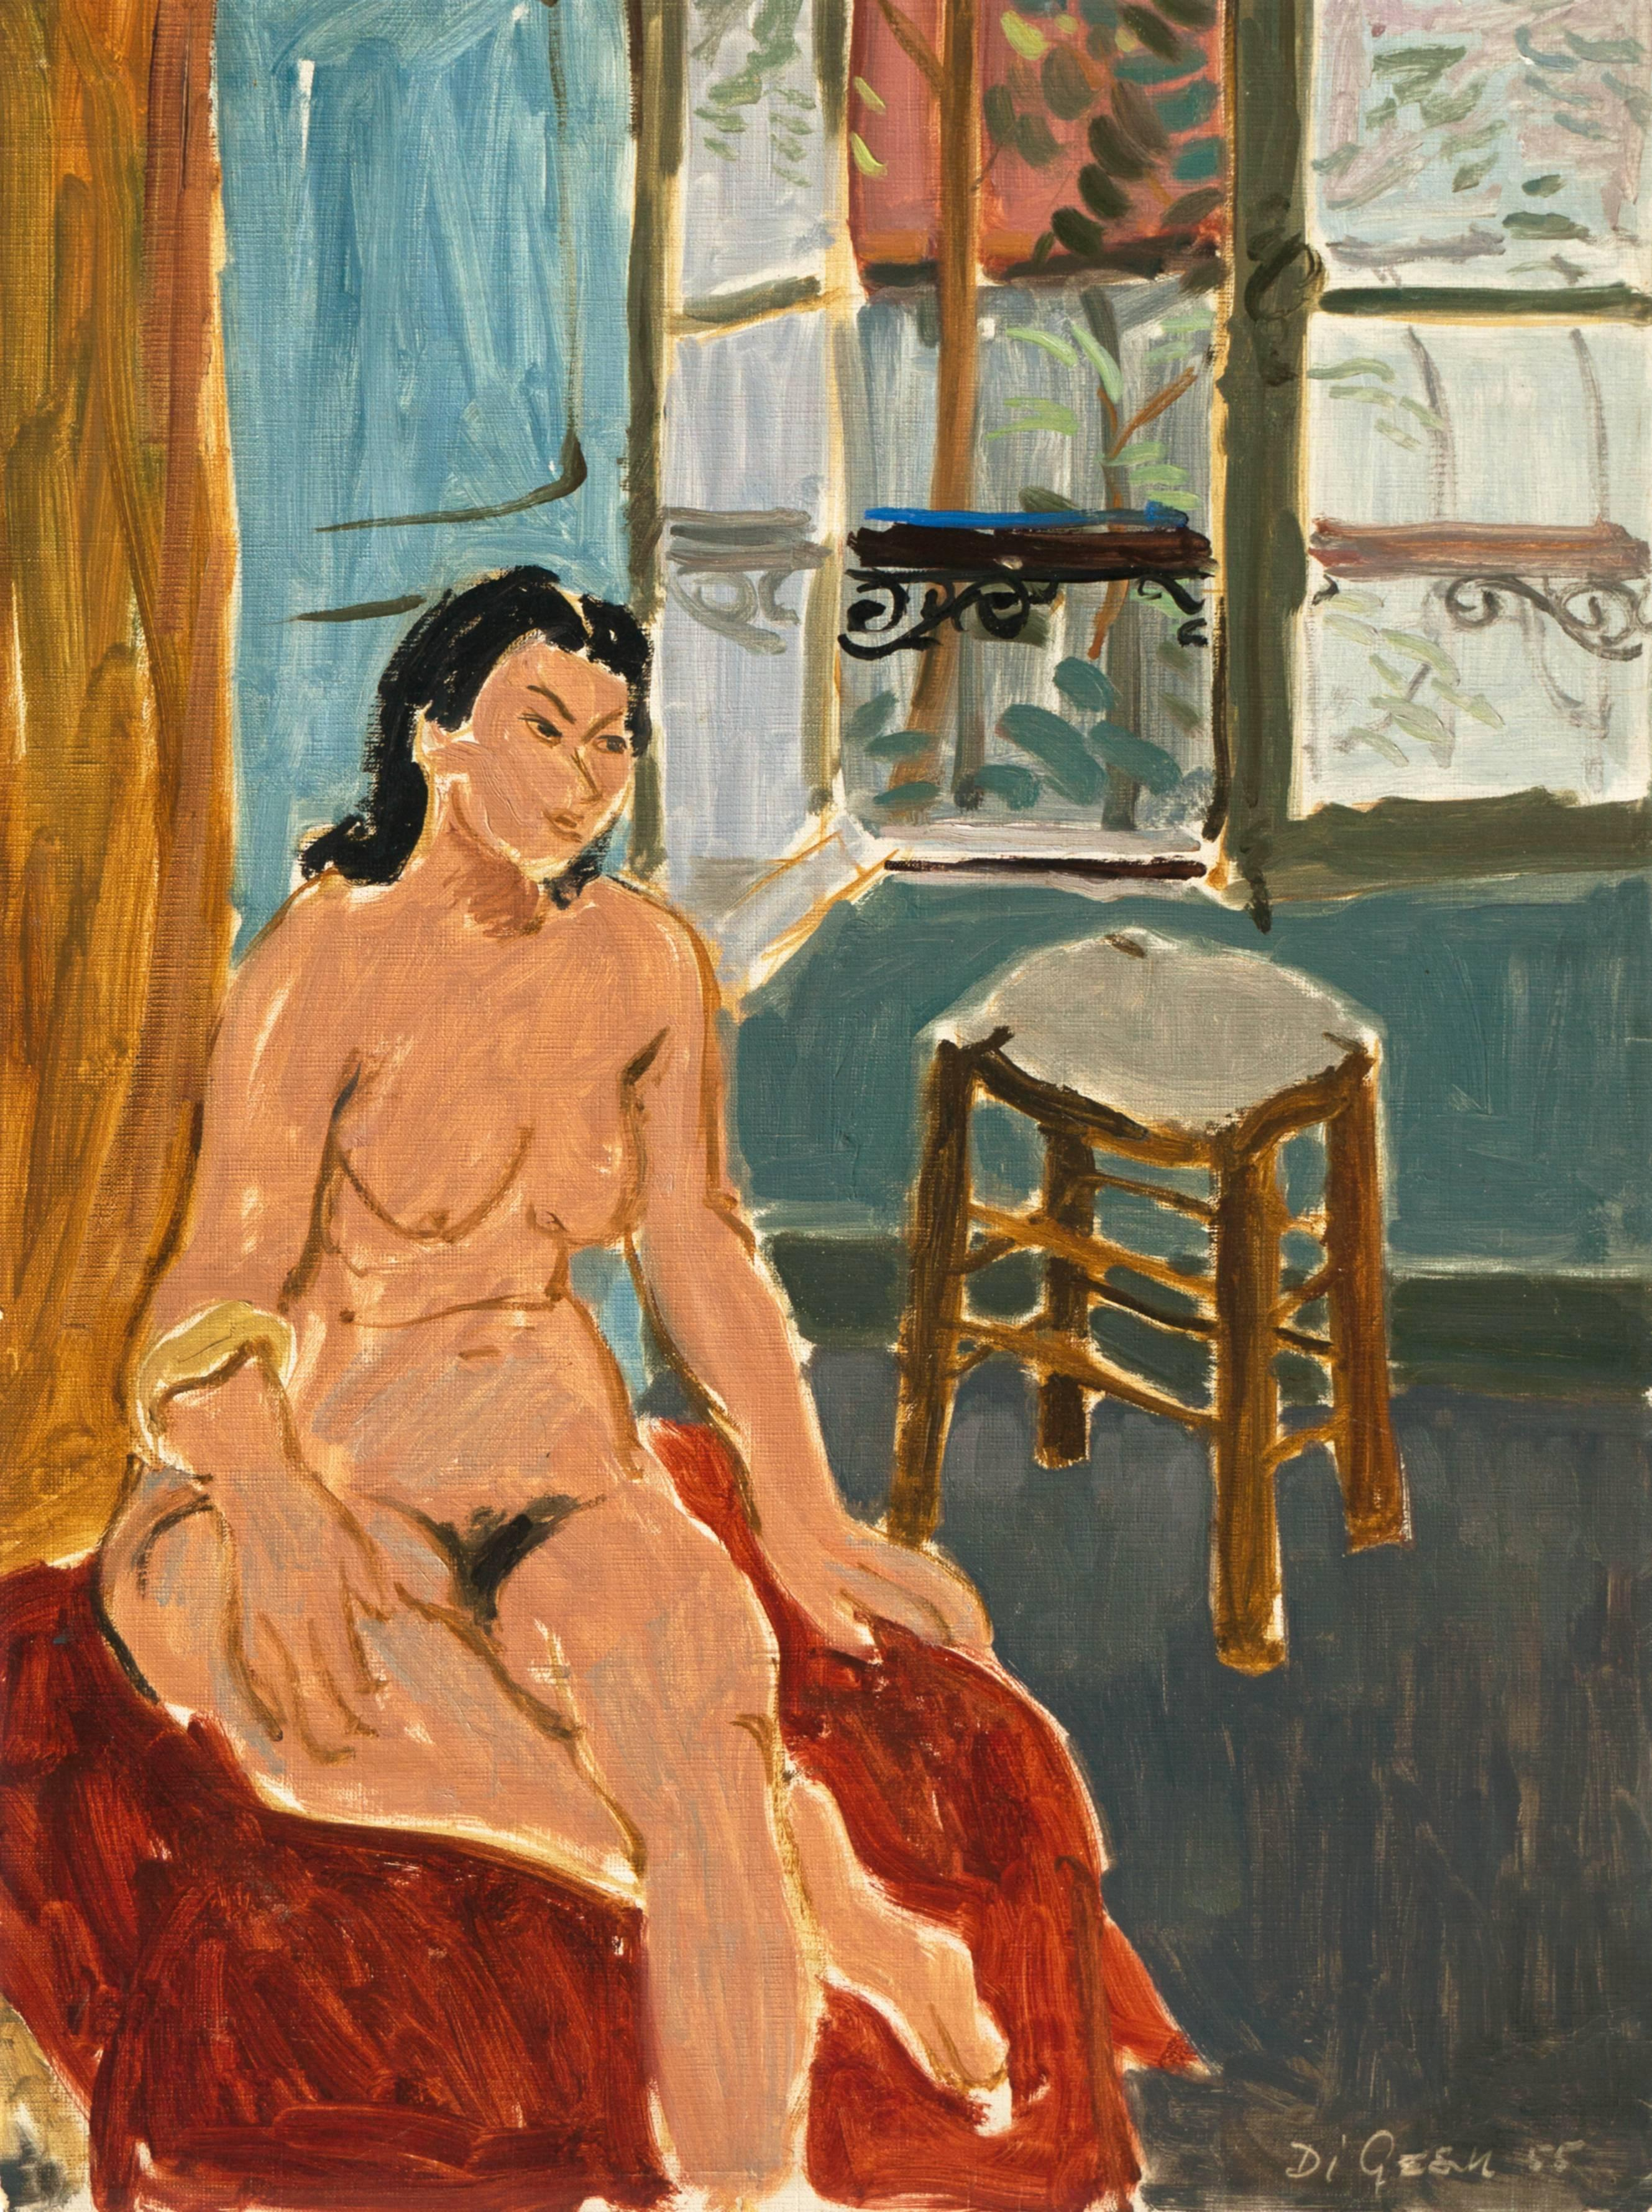 California Post-Impressionist 'Seated Nude', Louvre, Académie Chaumière, LACMA